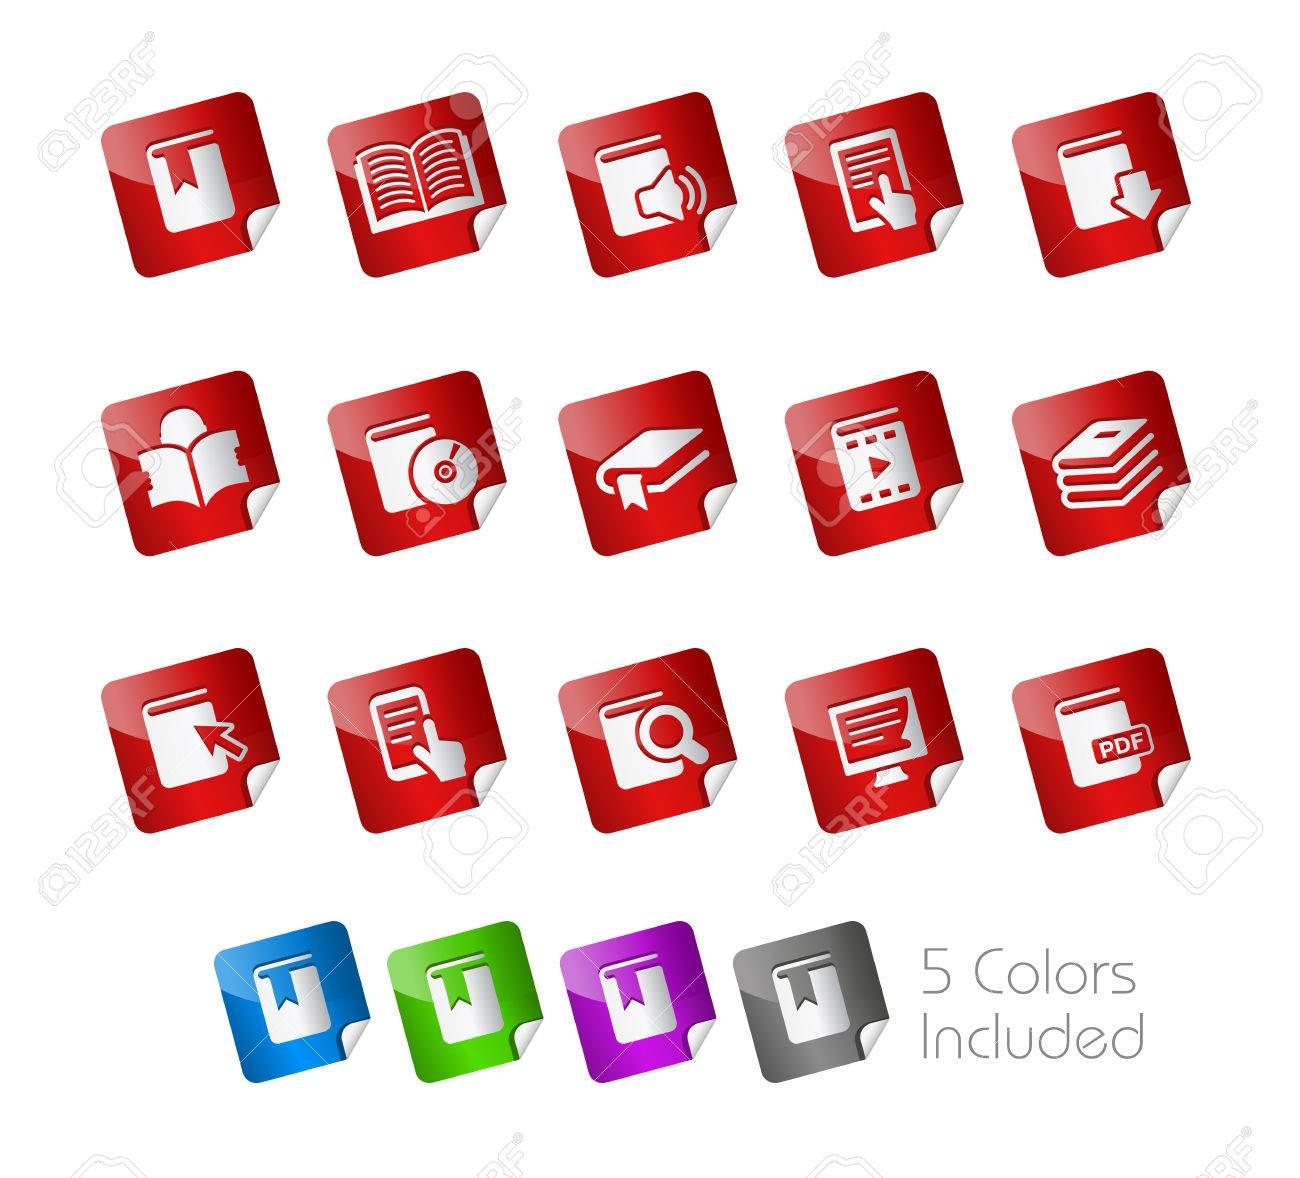 Book Stickers Stock Vector - 22536802